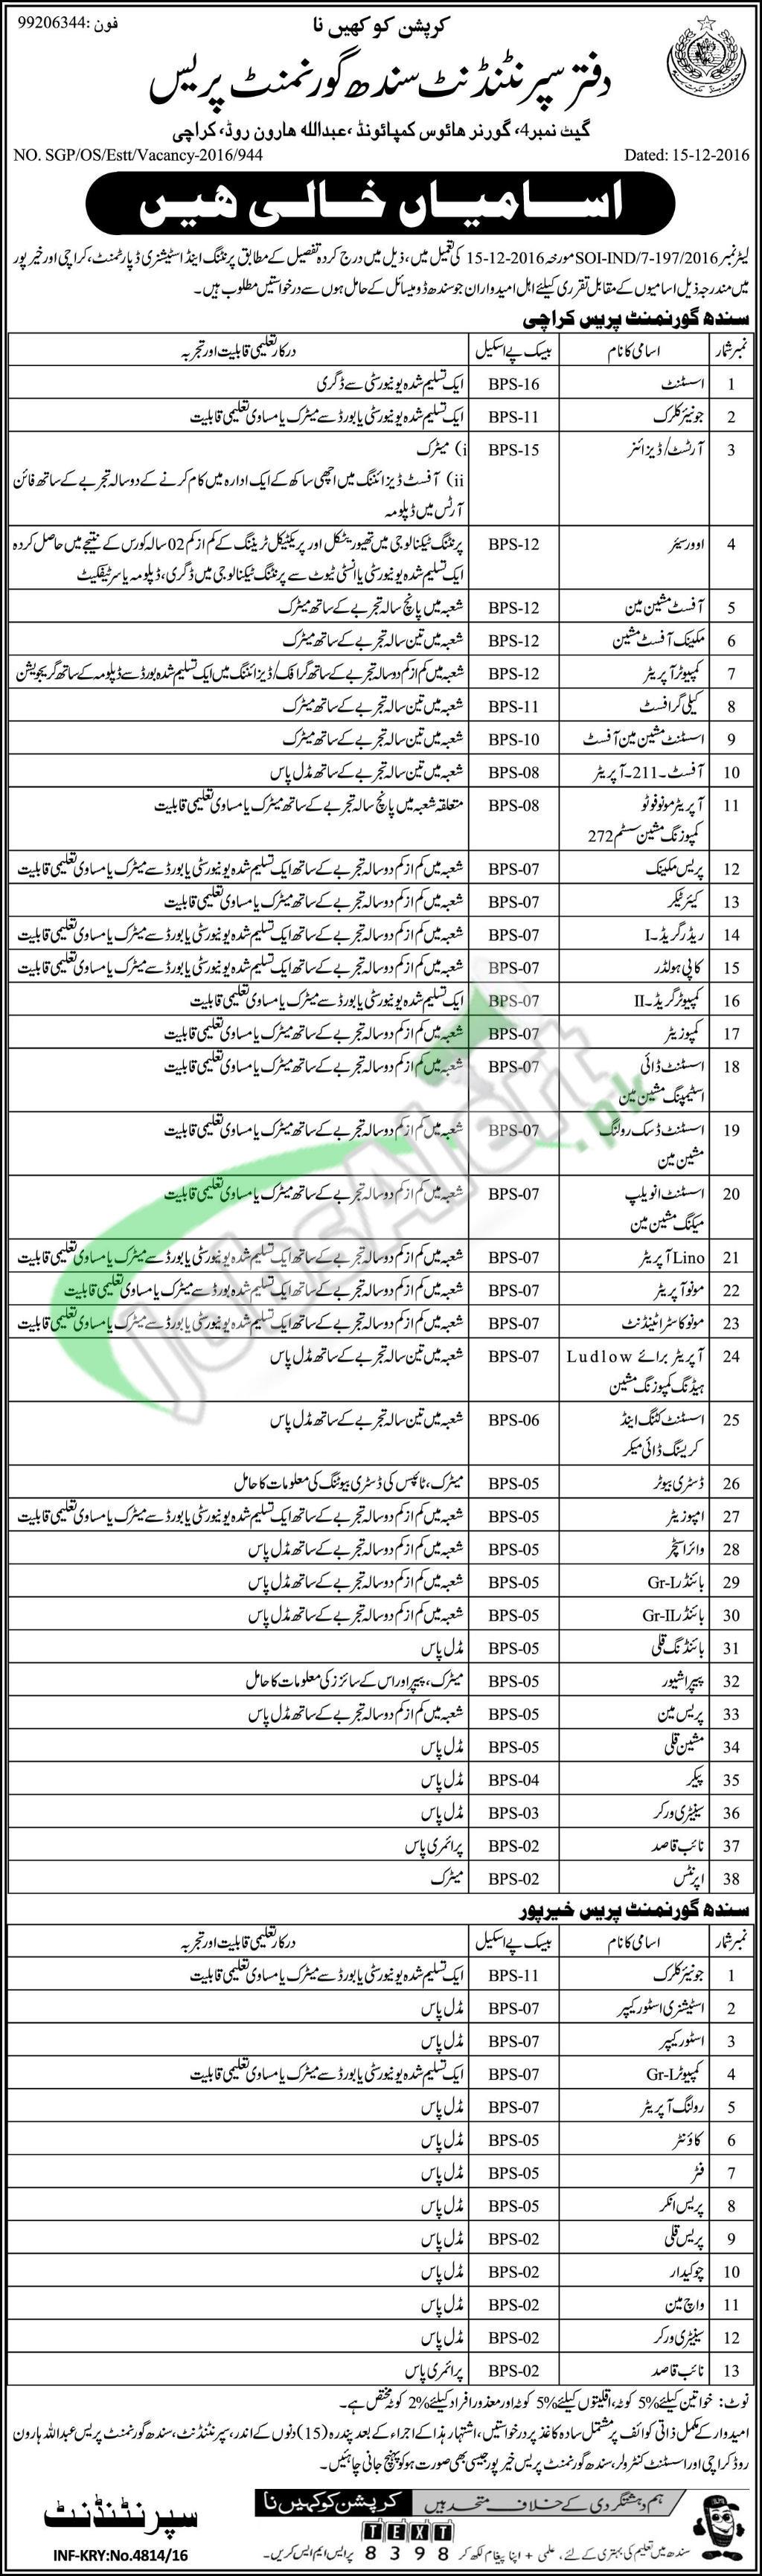 Sindh Govt Press